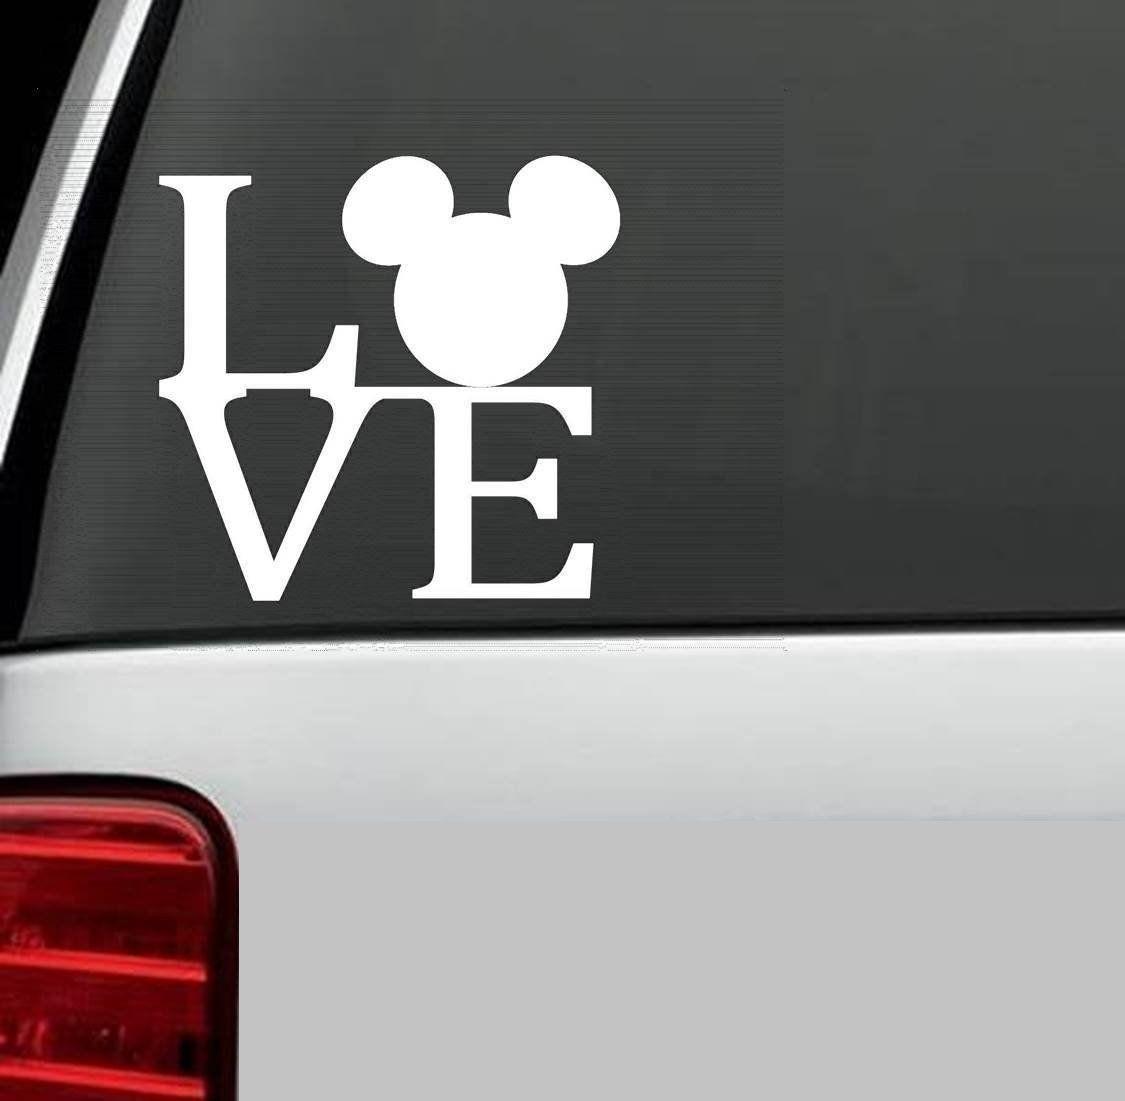 Love Mickey Mouse Ears Vinyl Decal Deal Disney Car Decals Vinyl Decals Vinyl Decal Stickers [ 1101 x 1125 Pixel ]